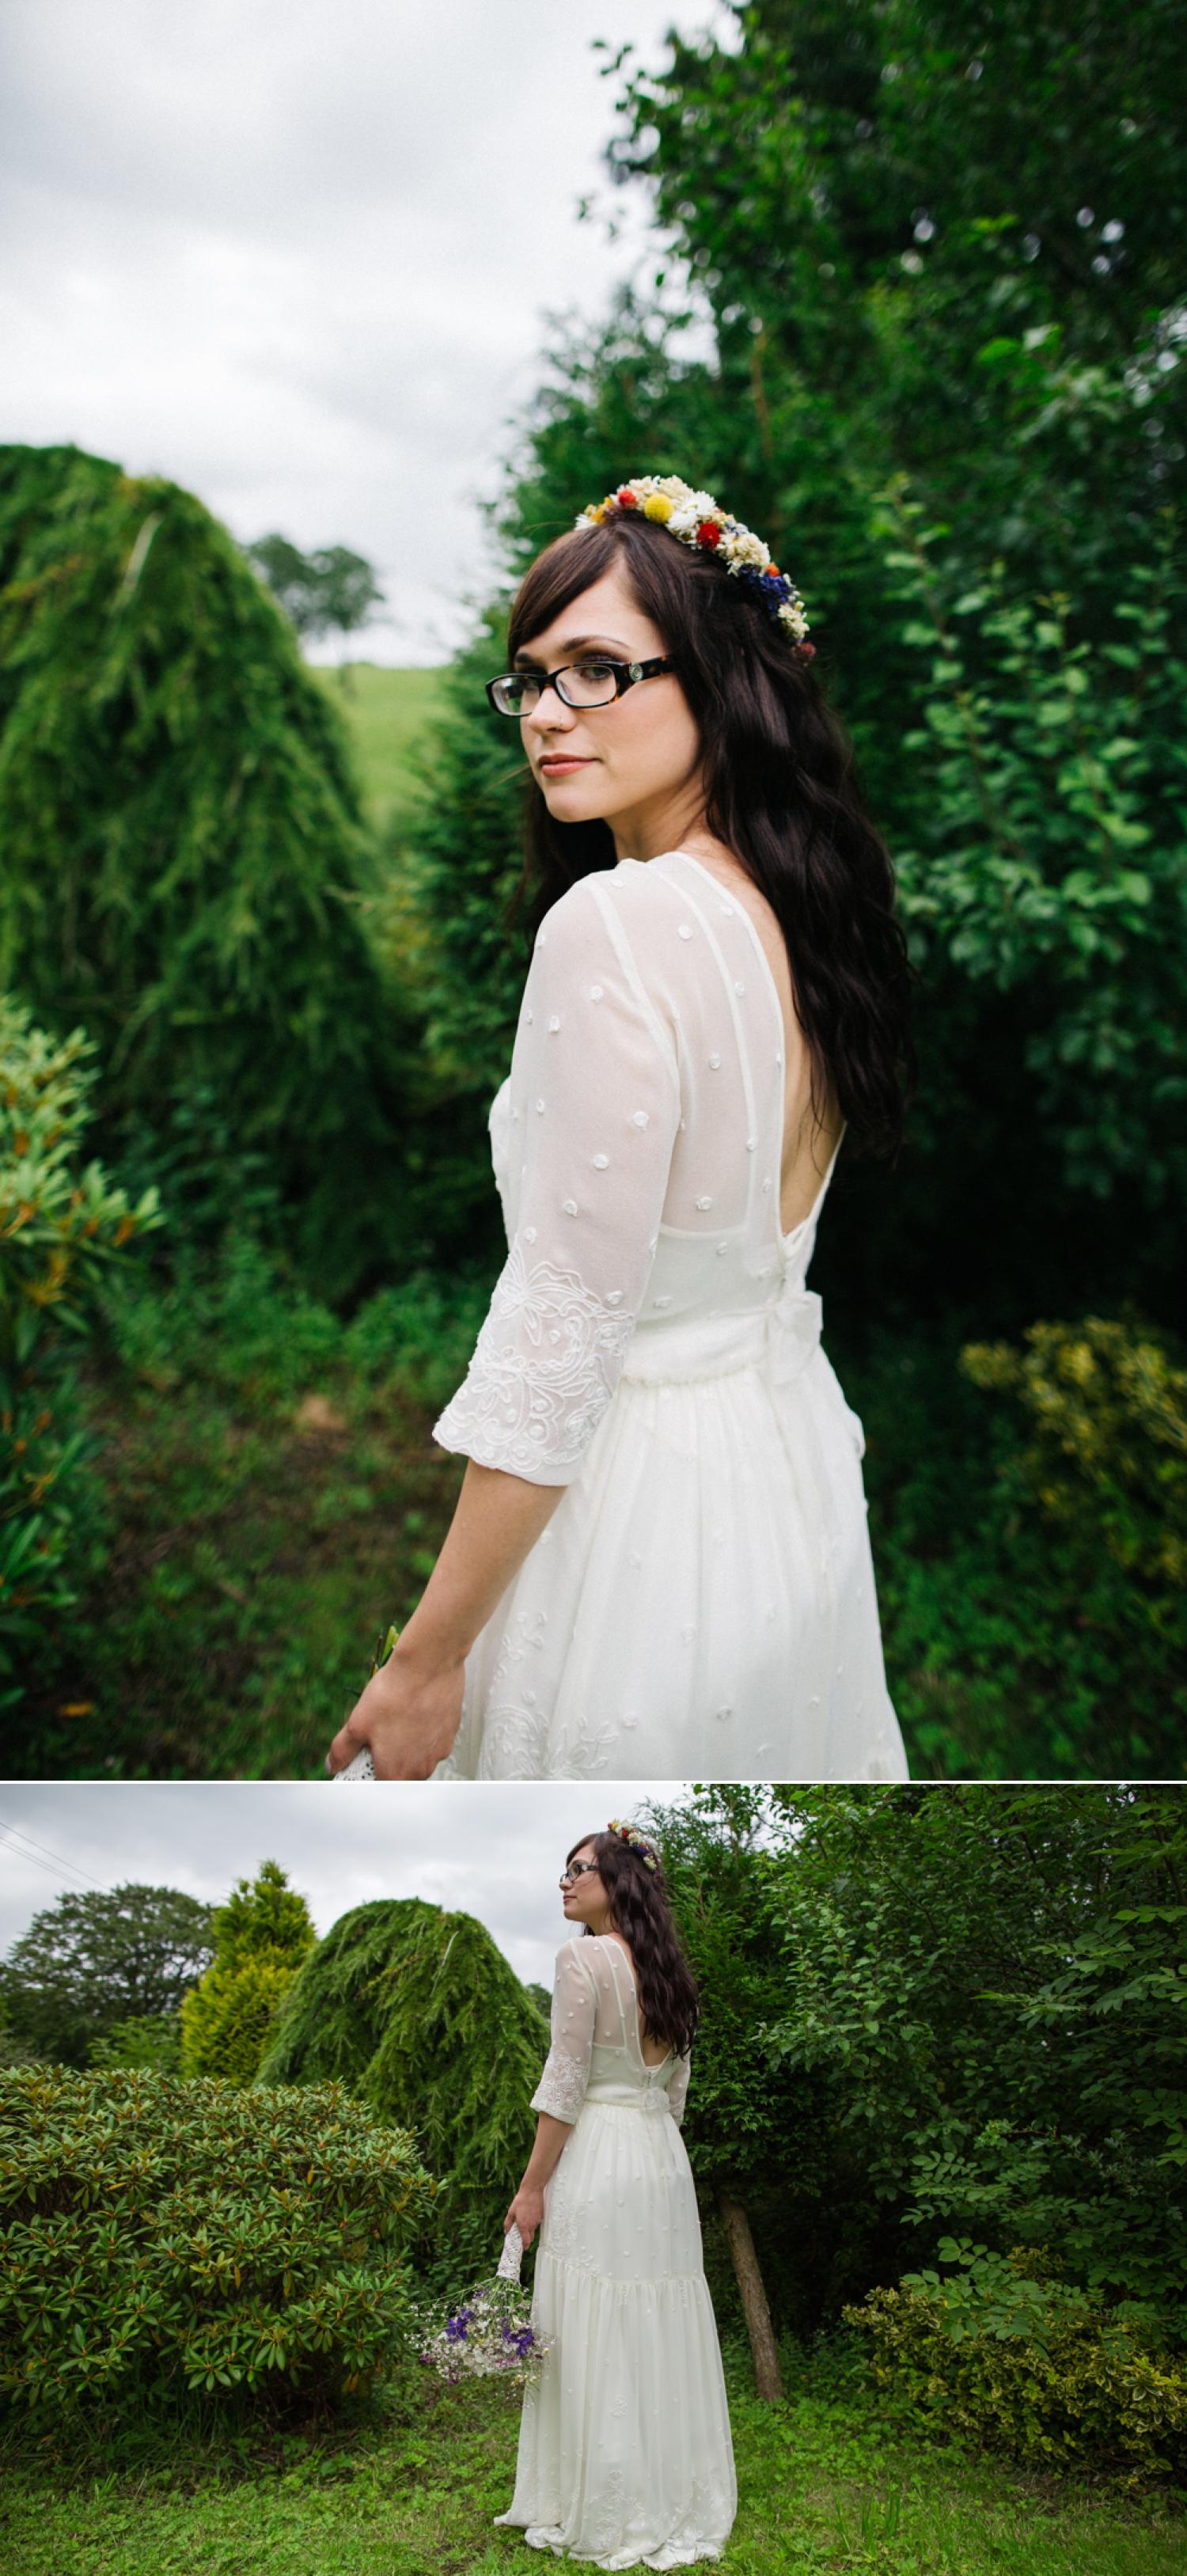 Cheshire Wedding Photographer Elly & Liam_0010